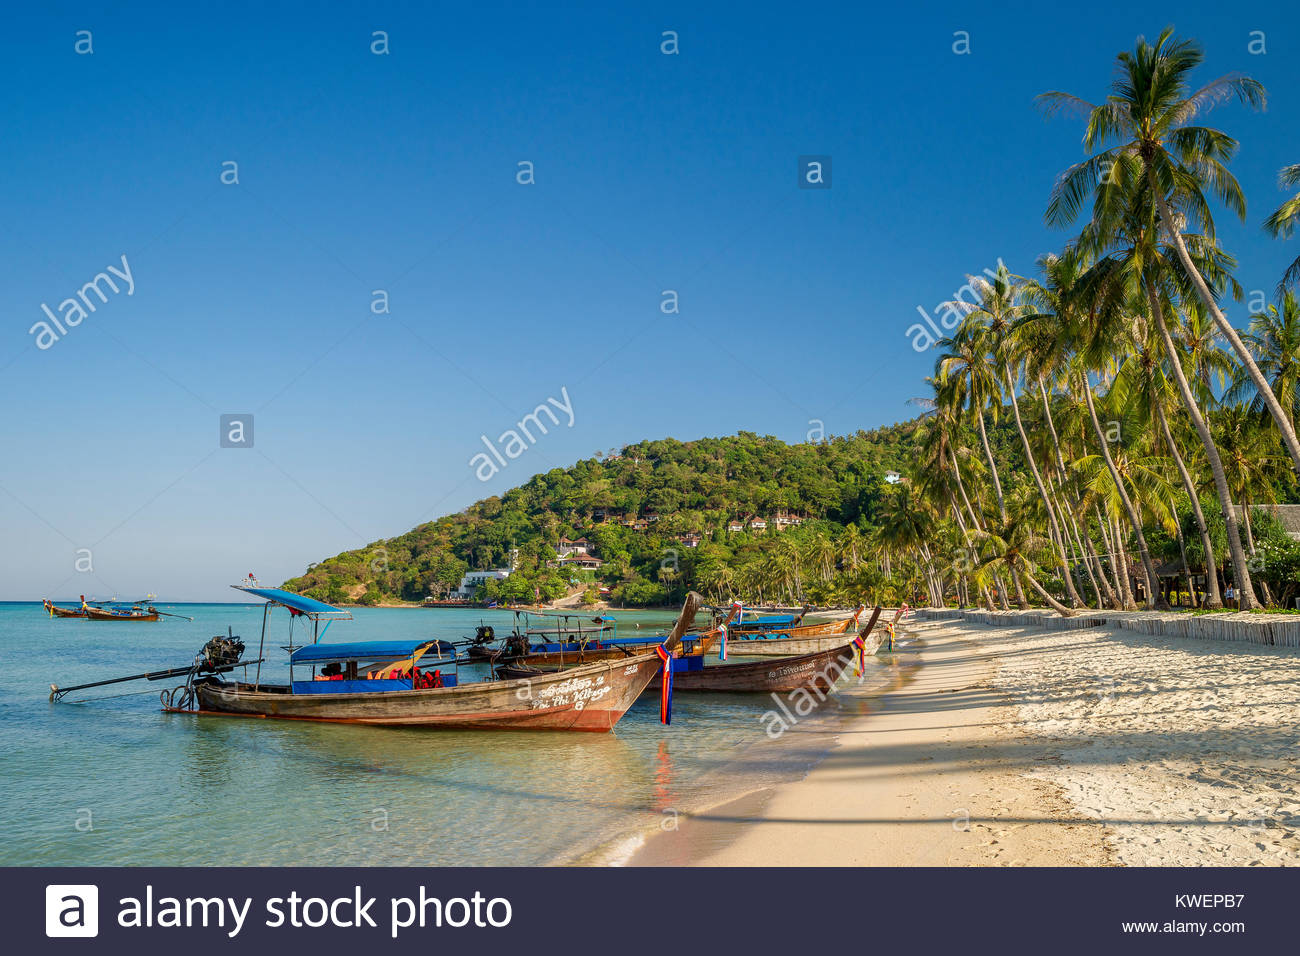 long-tail-boats-in-loh-bagao-bay-koh-phi